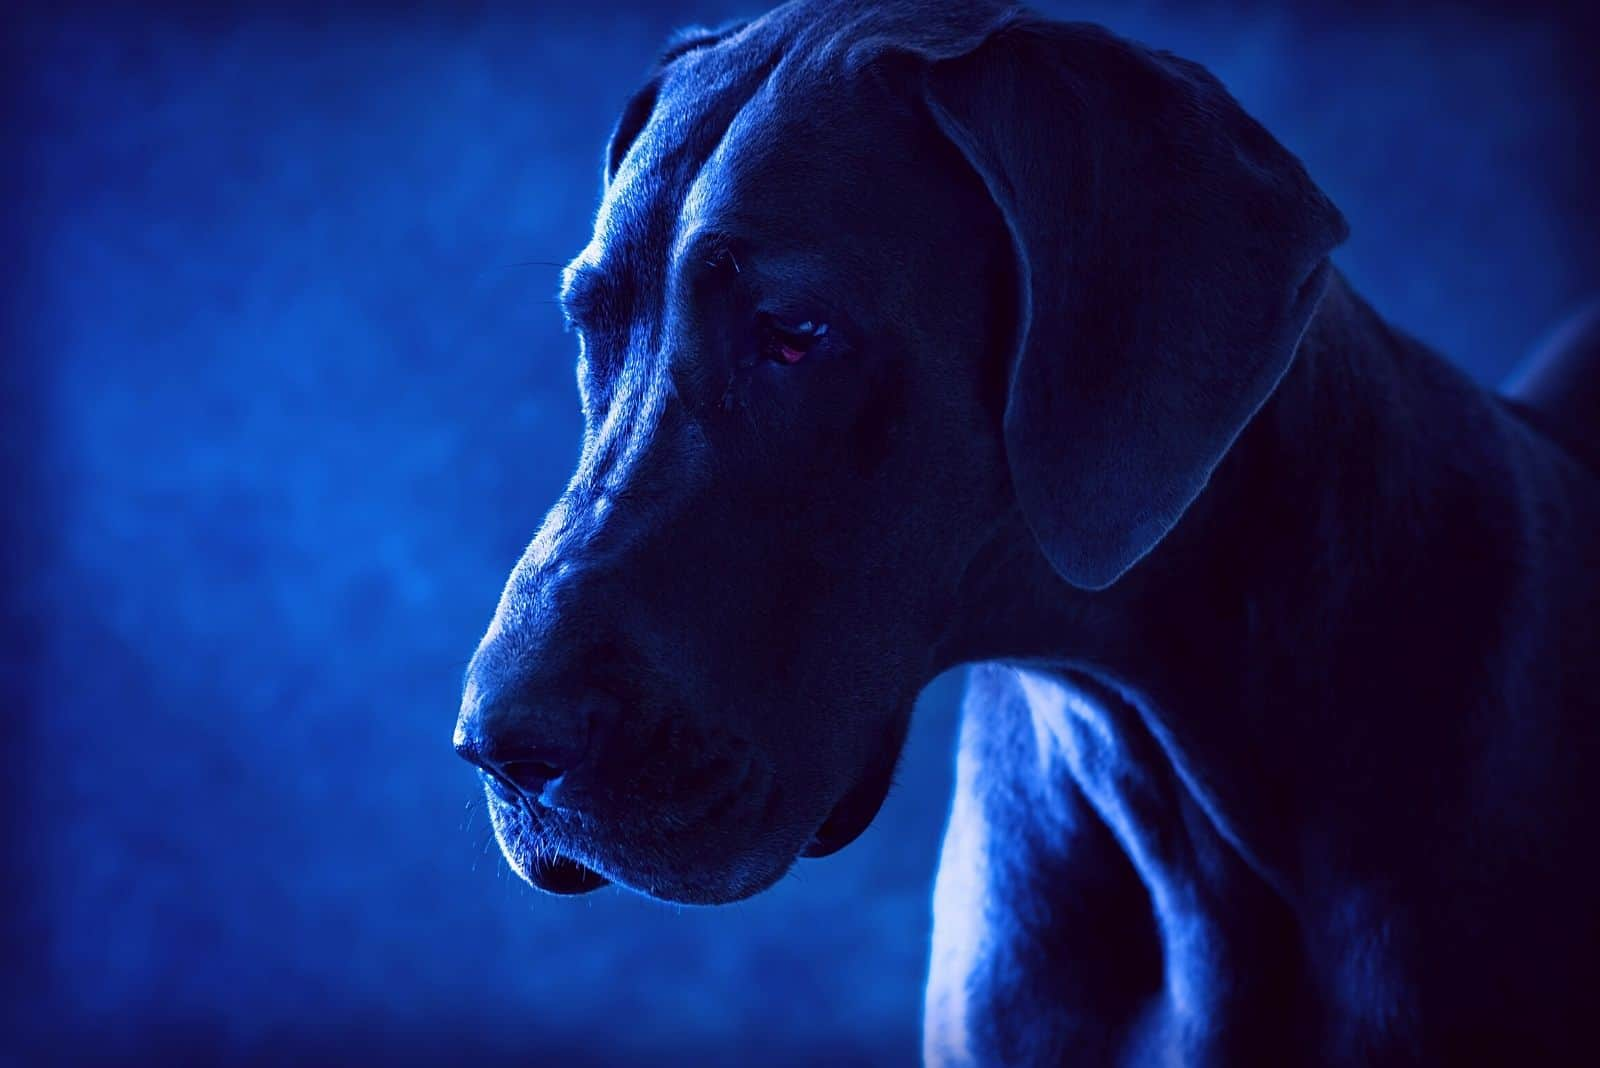 blue great dane in a dramatic studio lighting